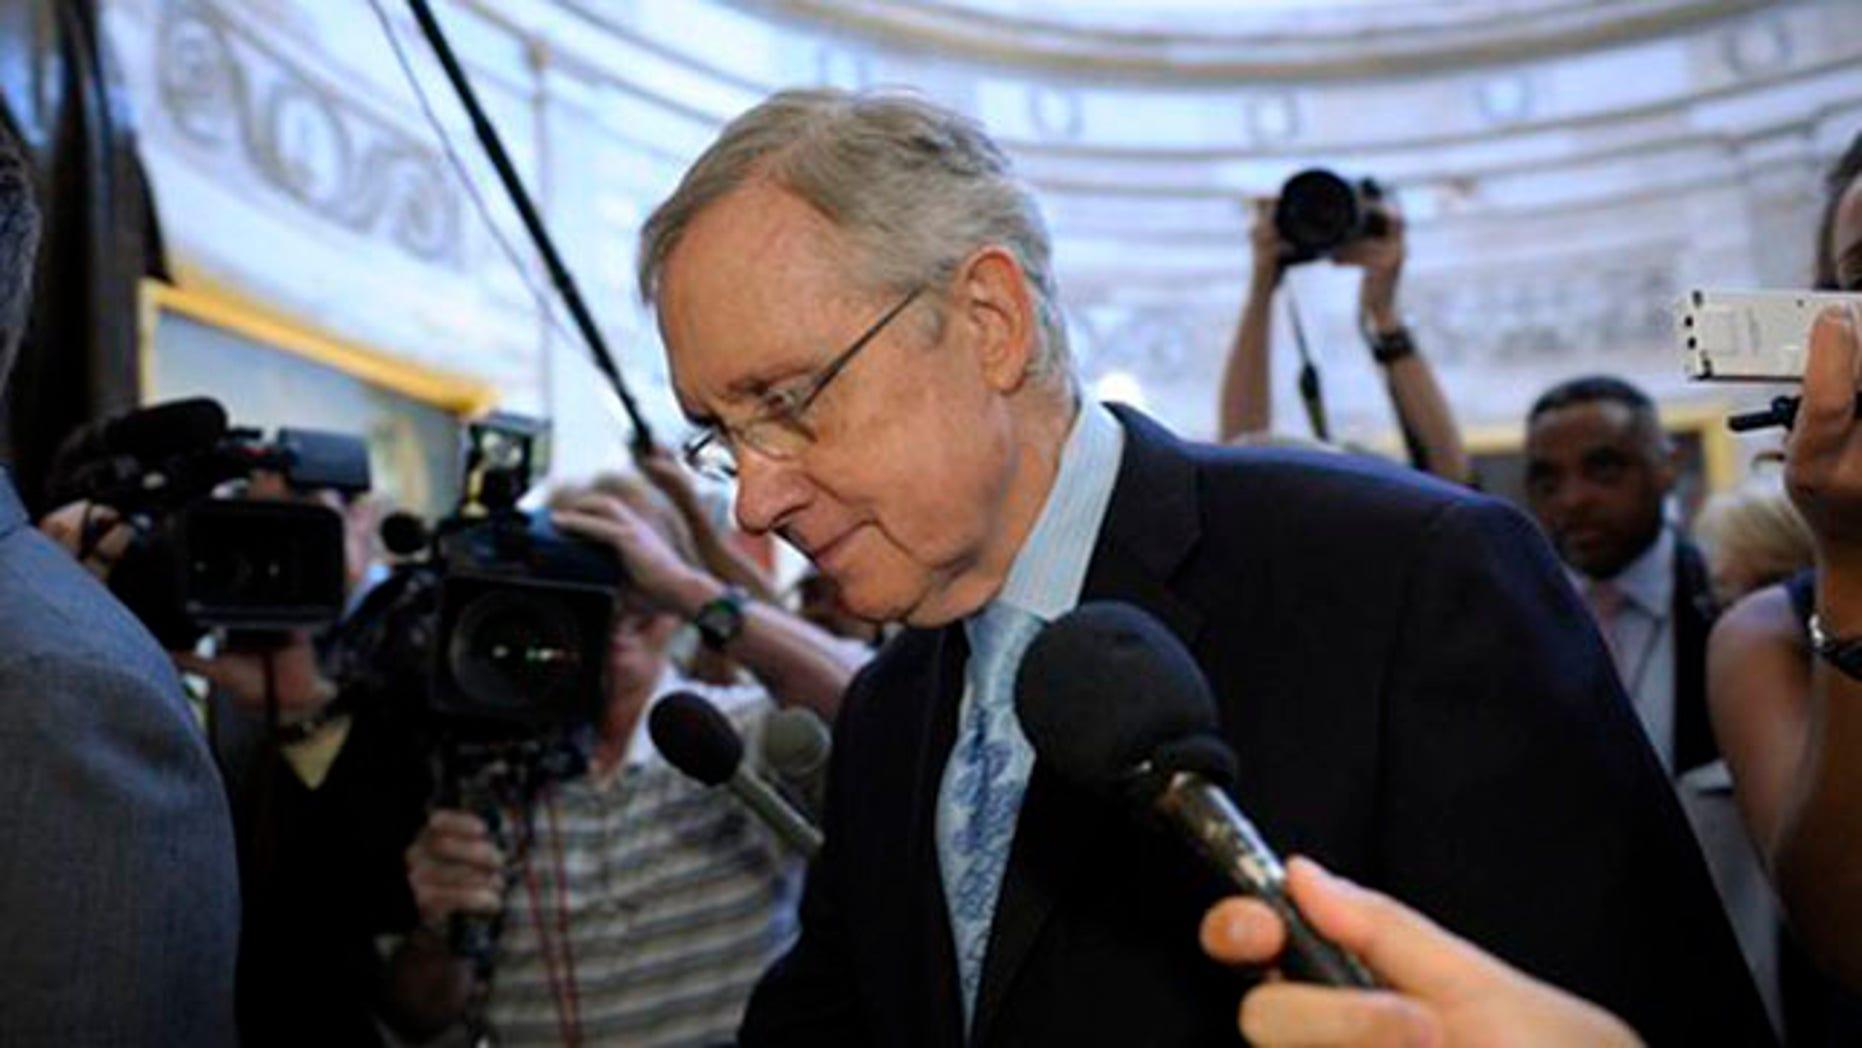 Senate Majority Leader Harry Reid is followed by reporters as he walks through the Capitol Rotunda on Capitol Hill July 31.